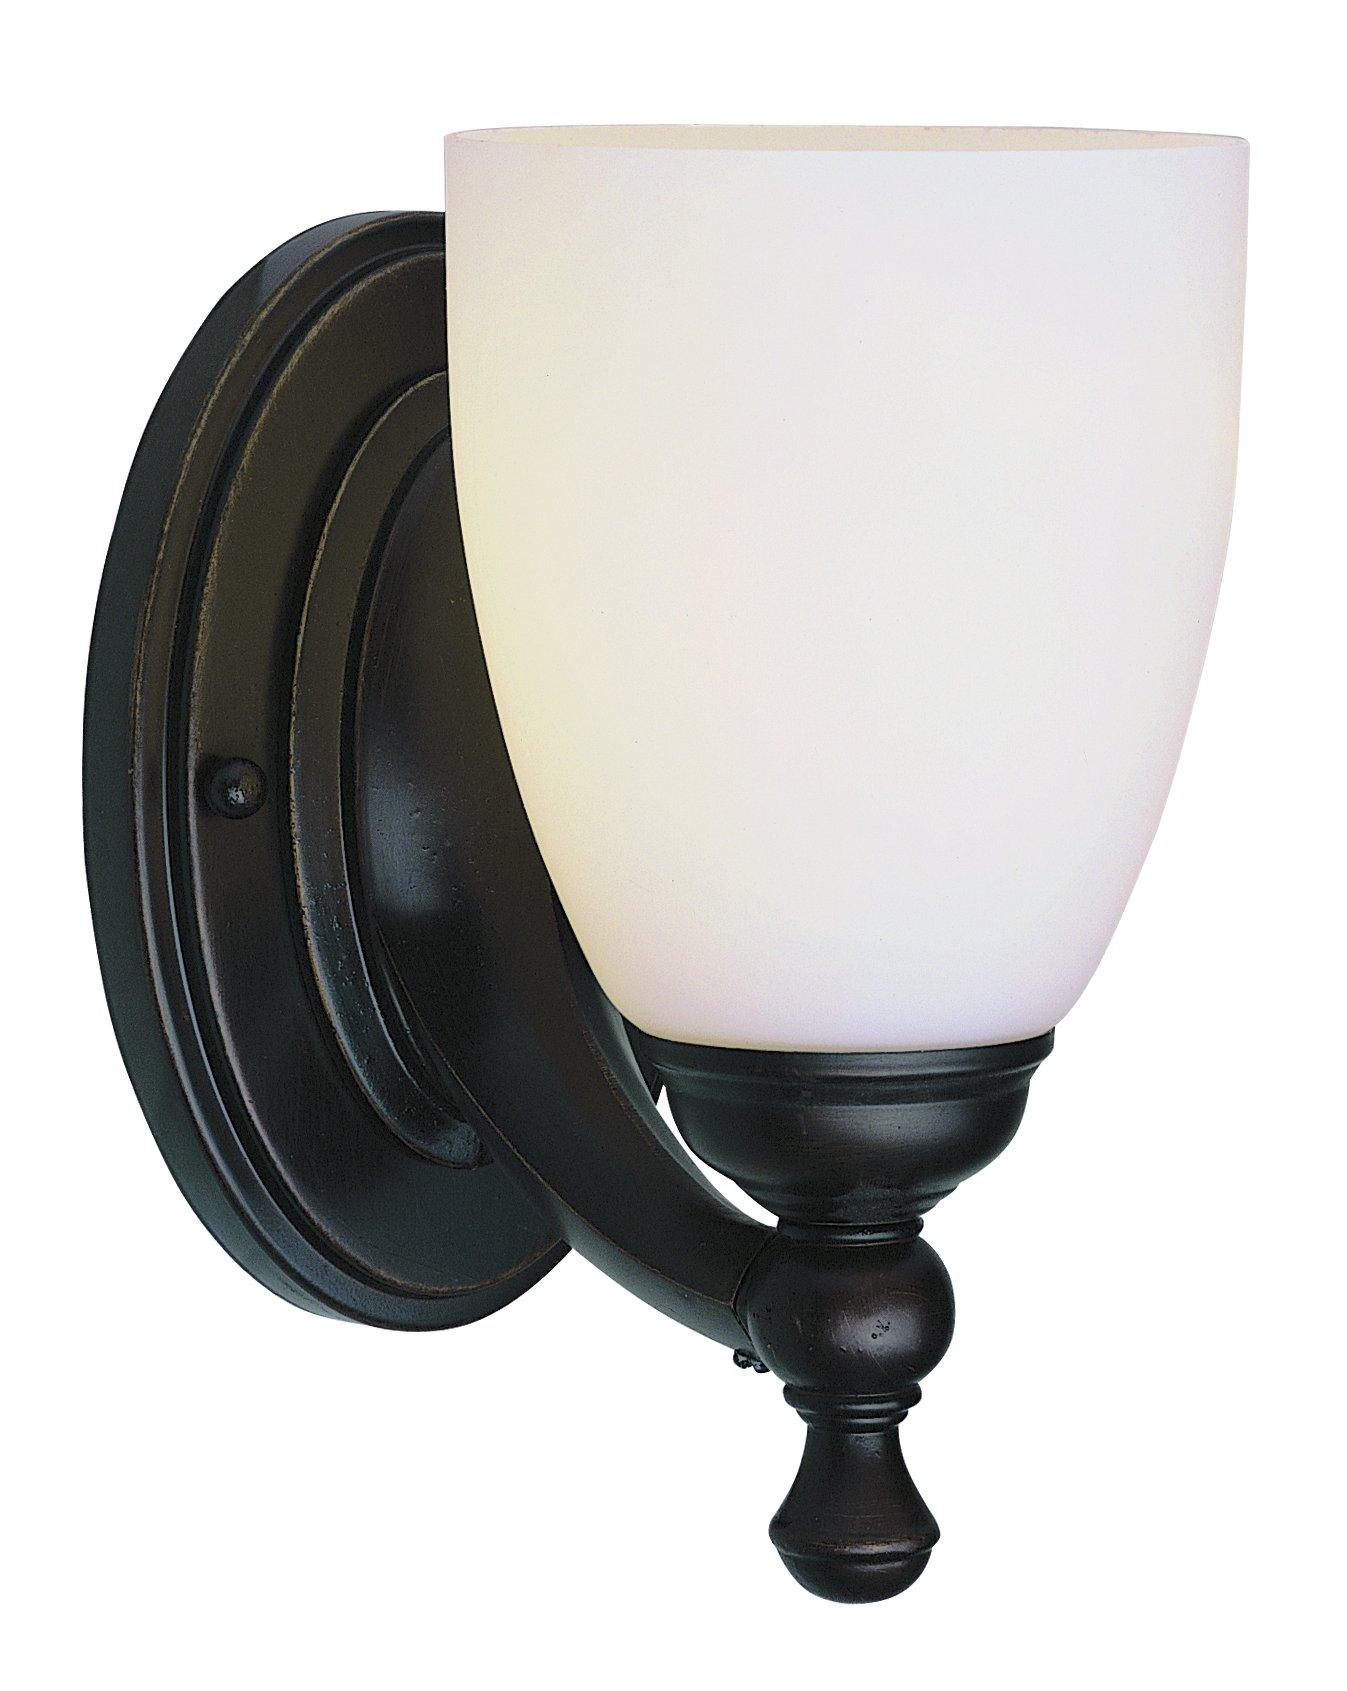 Trans Globe Lighting 3651 ROB Indoor Eleanor 5'' Wall Sconce, Rubbed Oil Bronze by Trans Globe Lighting